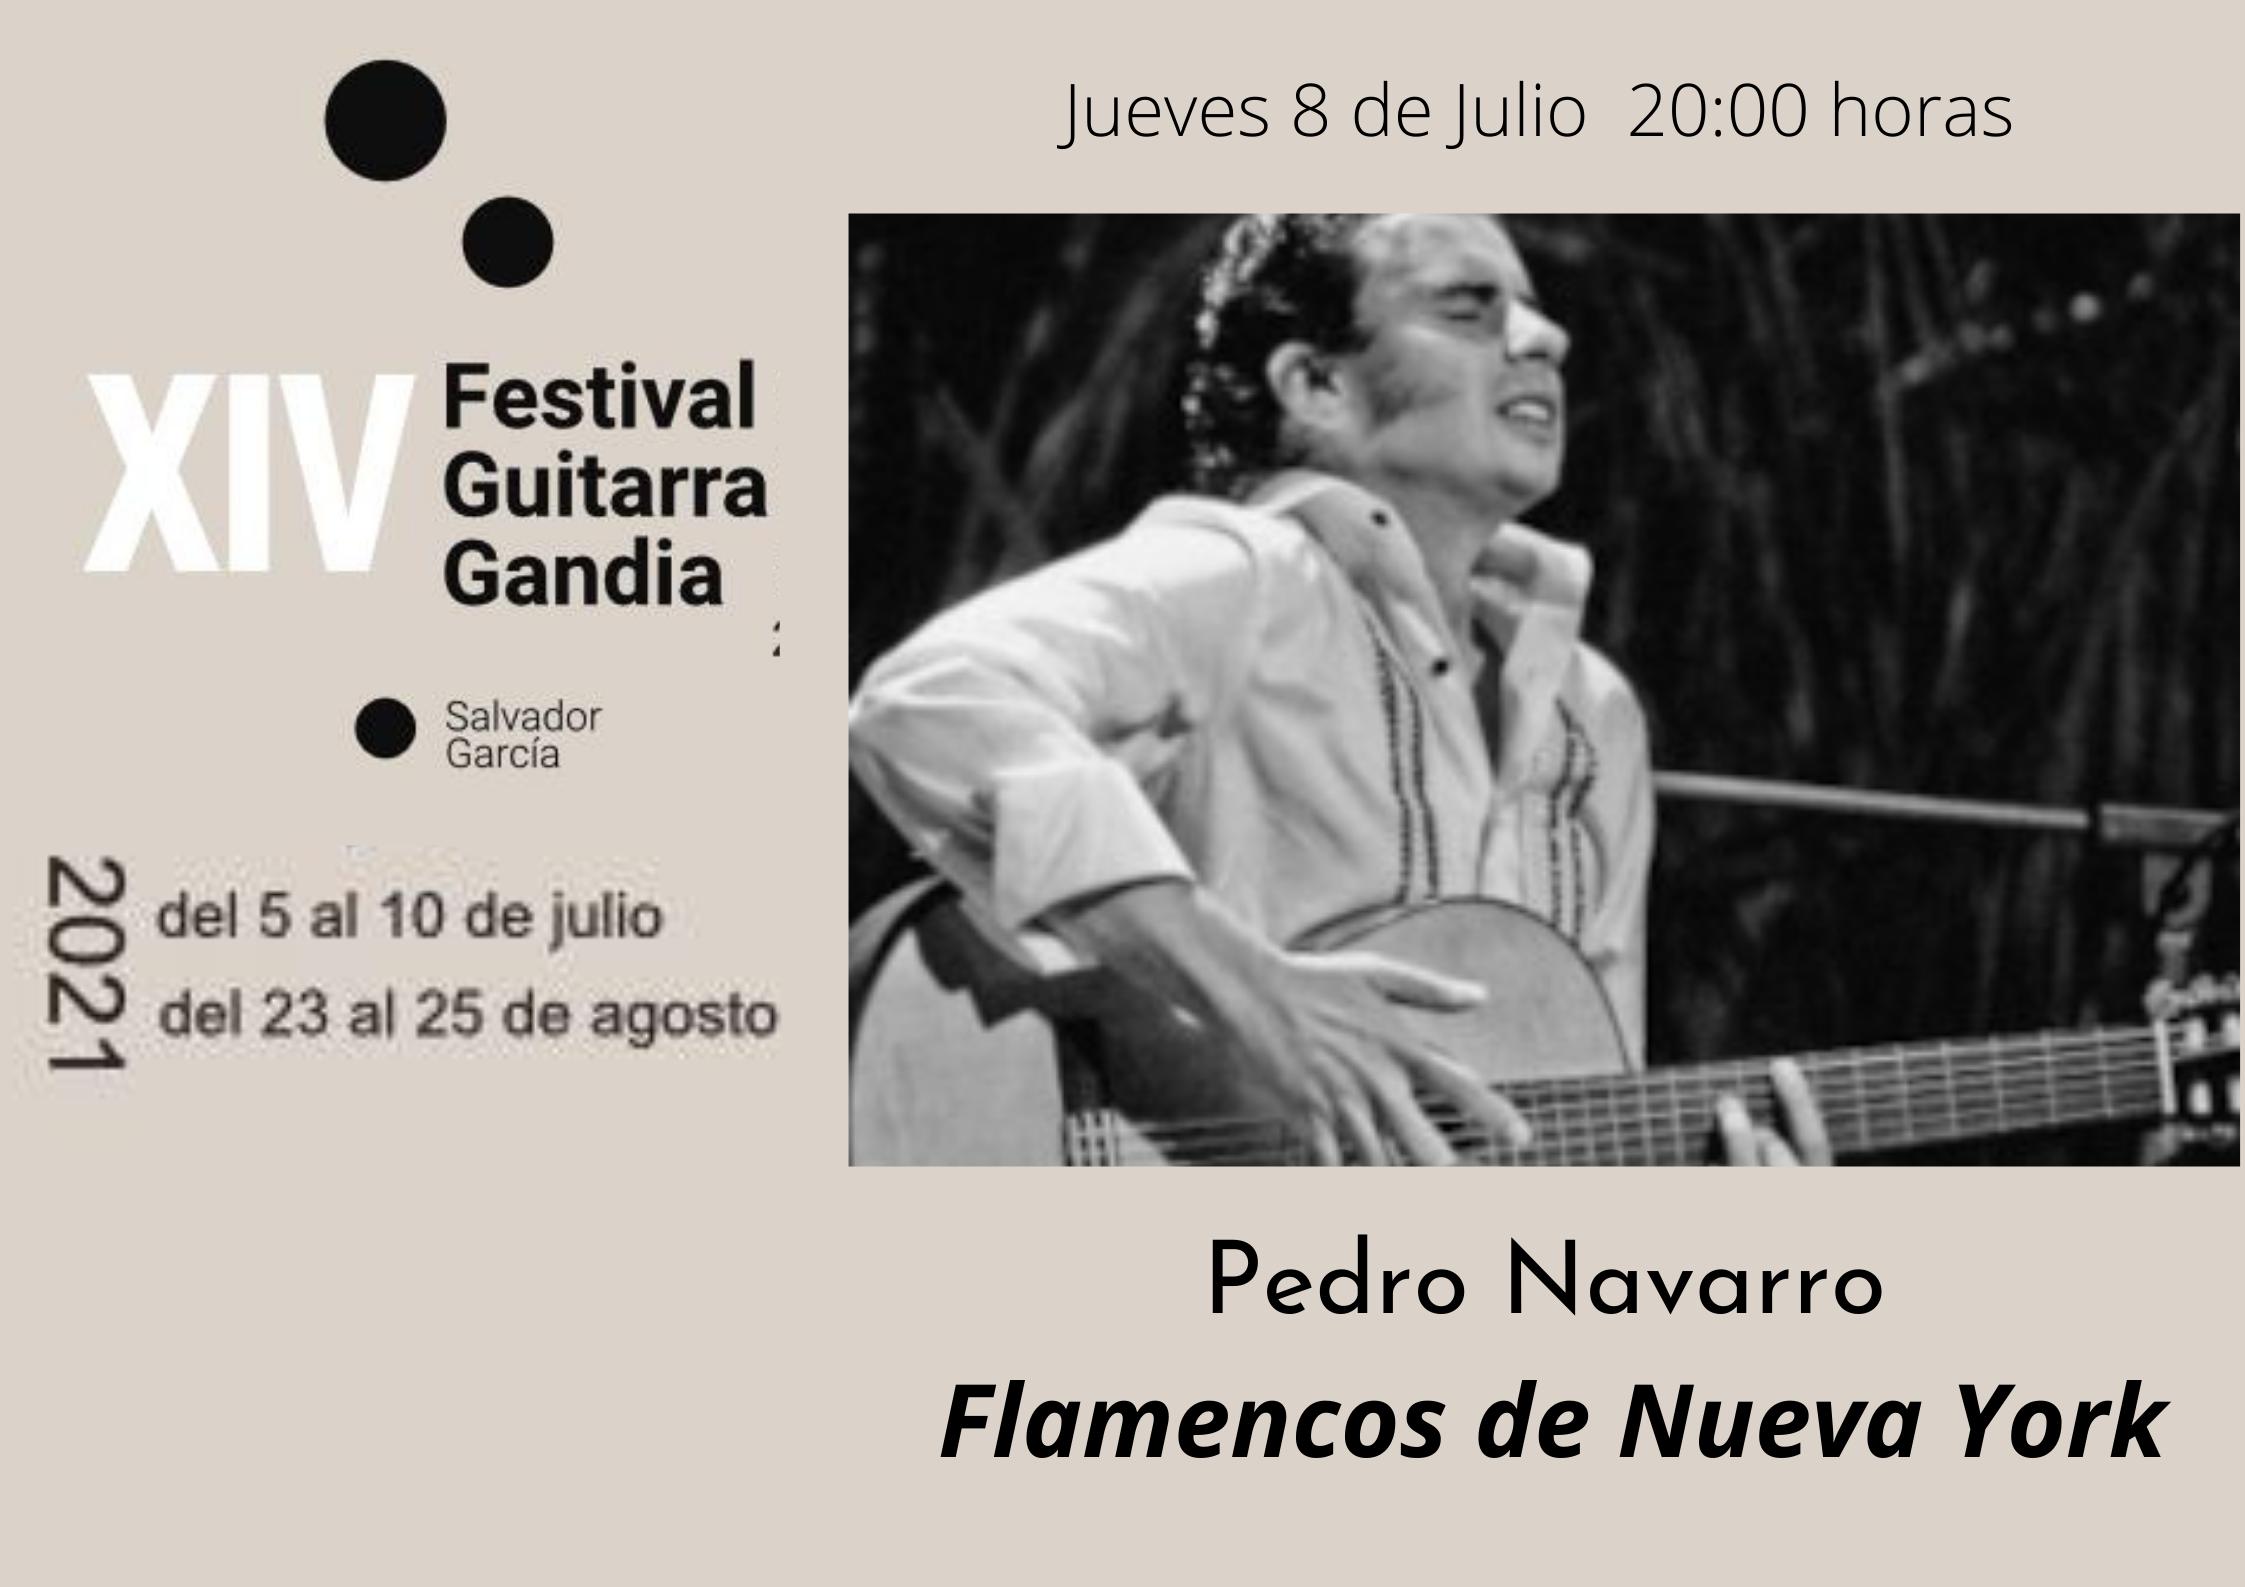 FESTIVAL DE GUITARRA GANDIA: Pedro Navarro